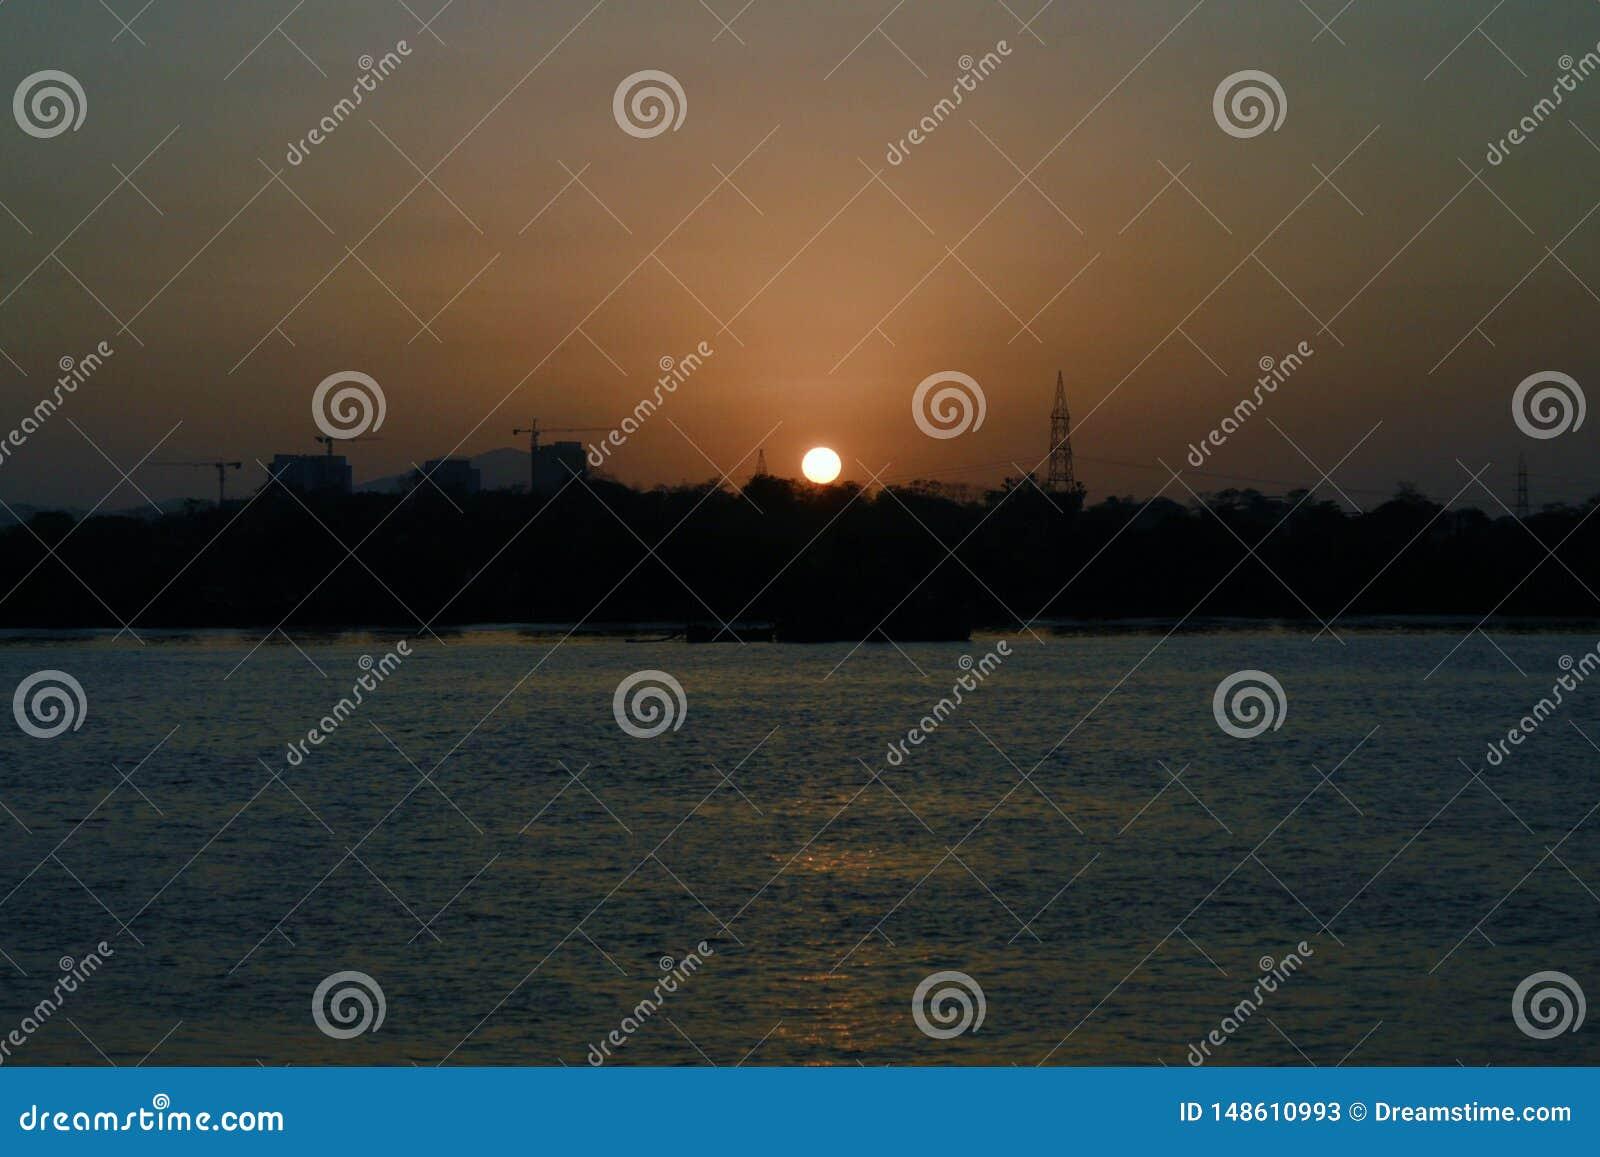 The sunset near river